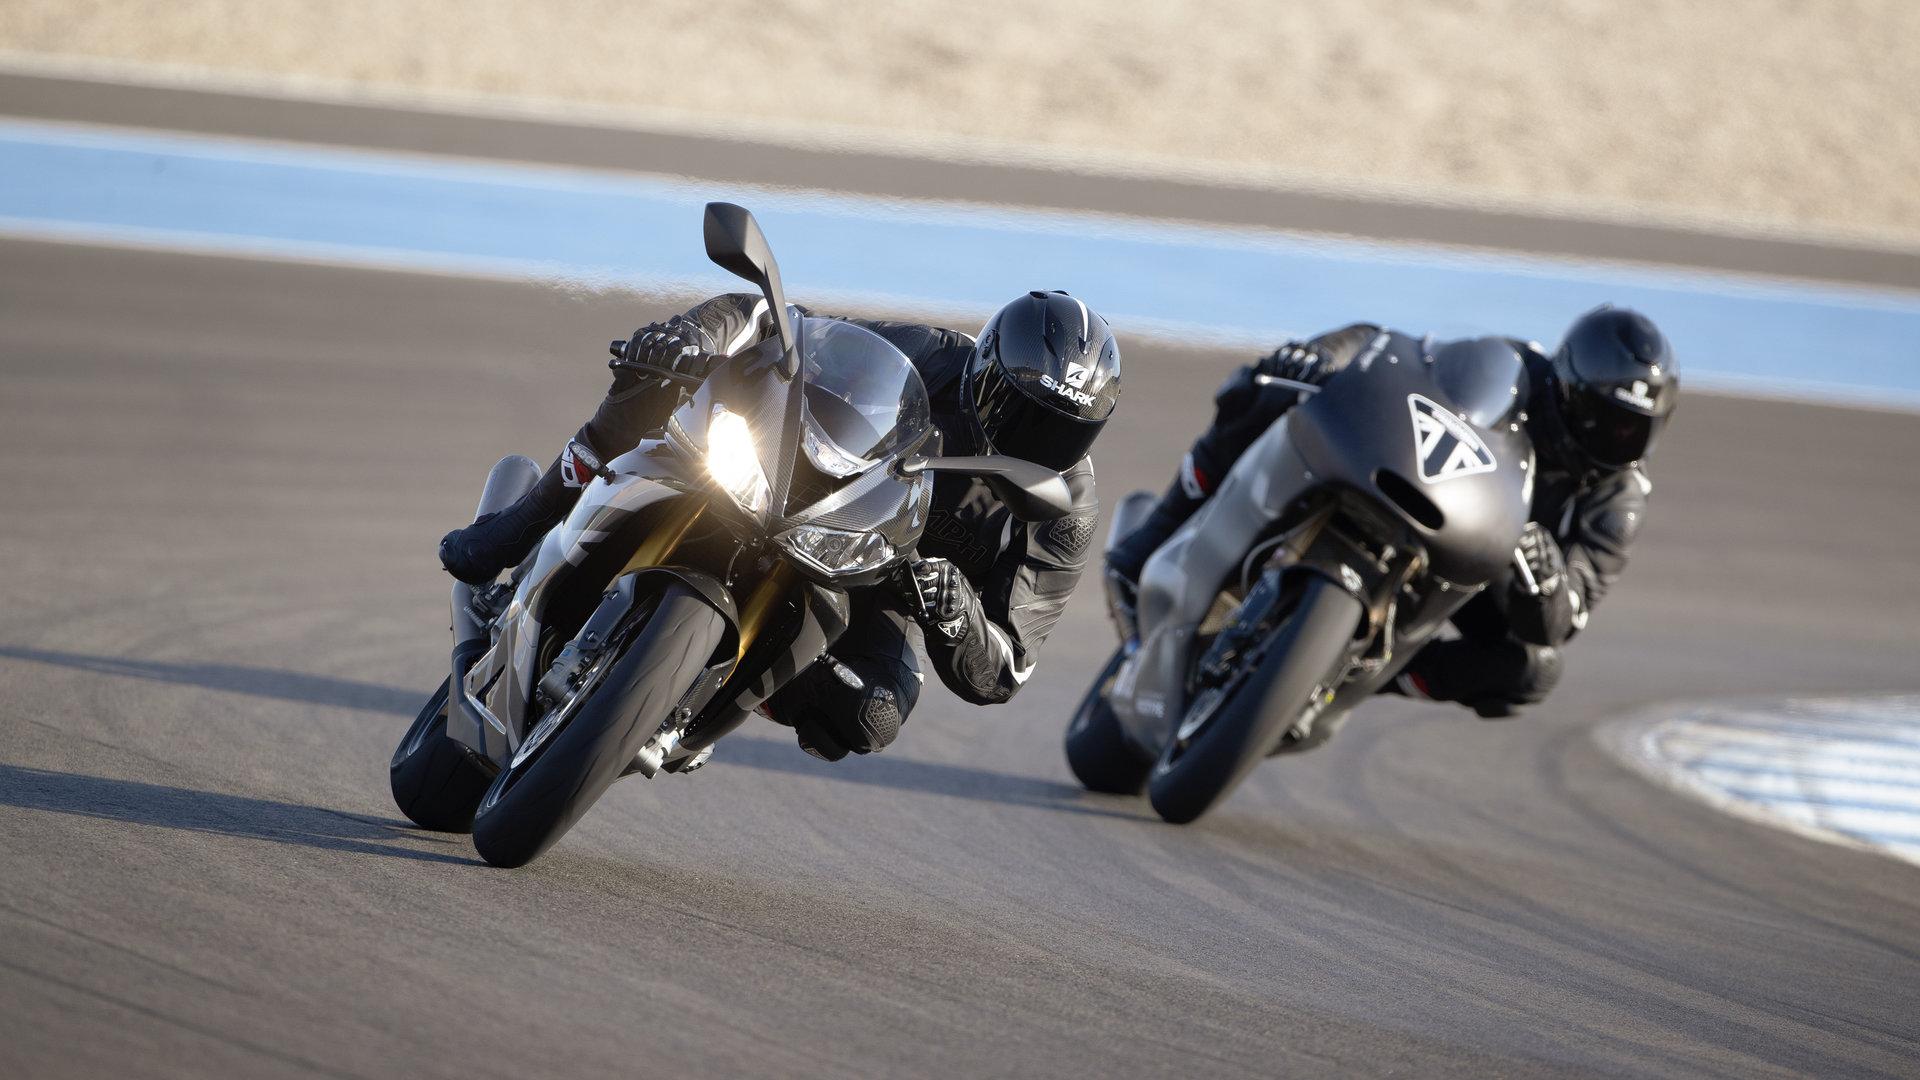 Triumph Daytona Moto2 765 02